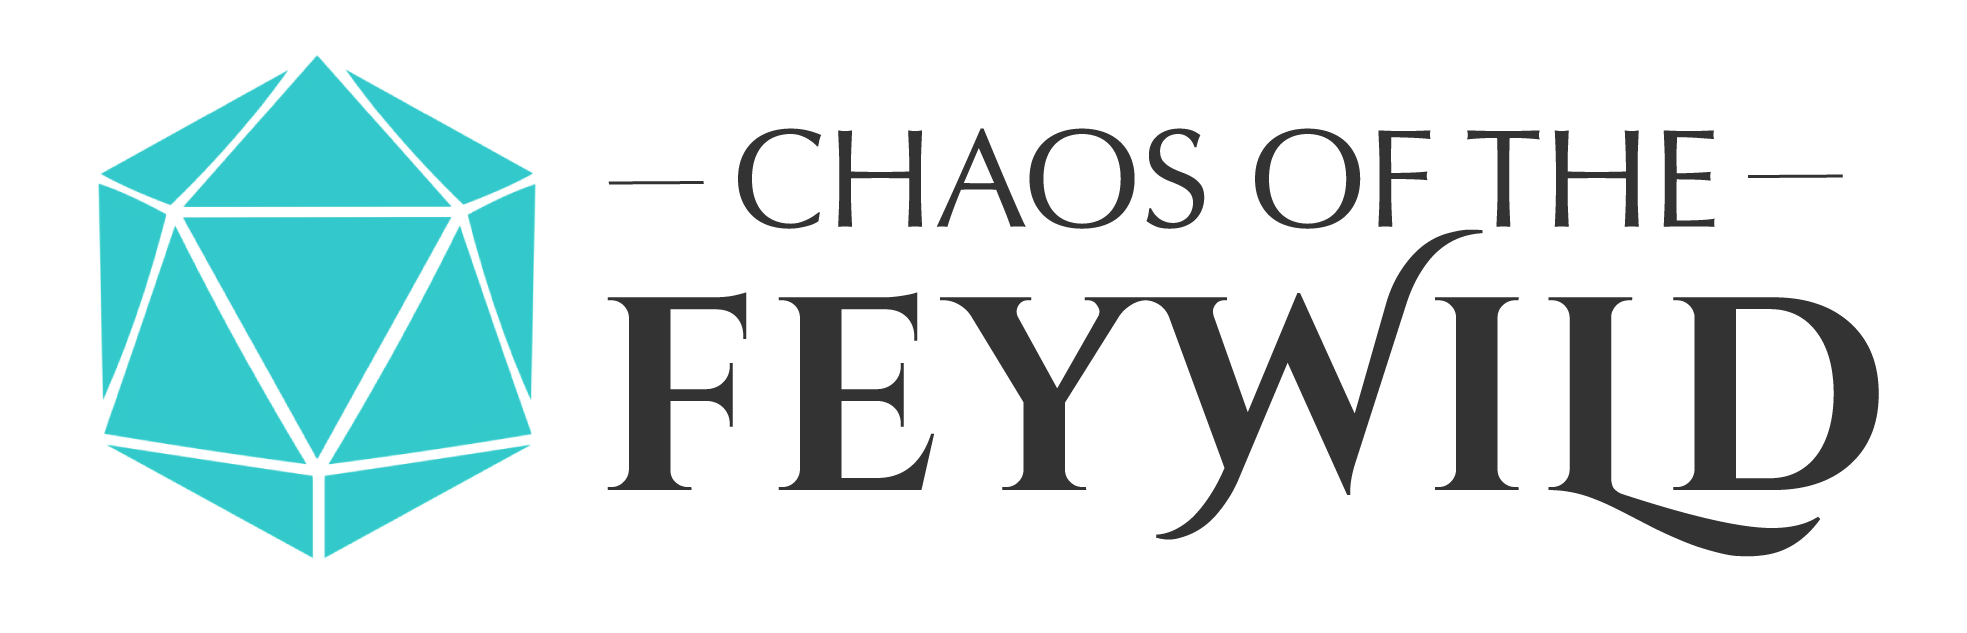 Chaos of the Feywild